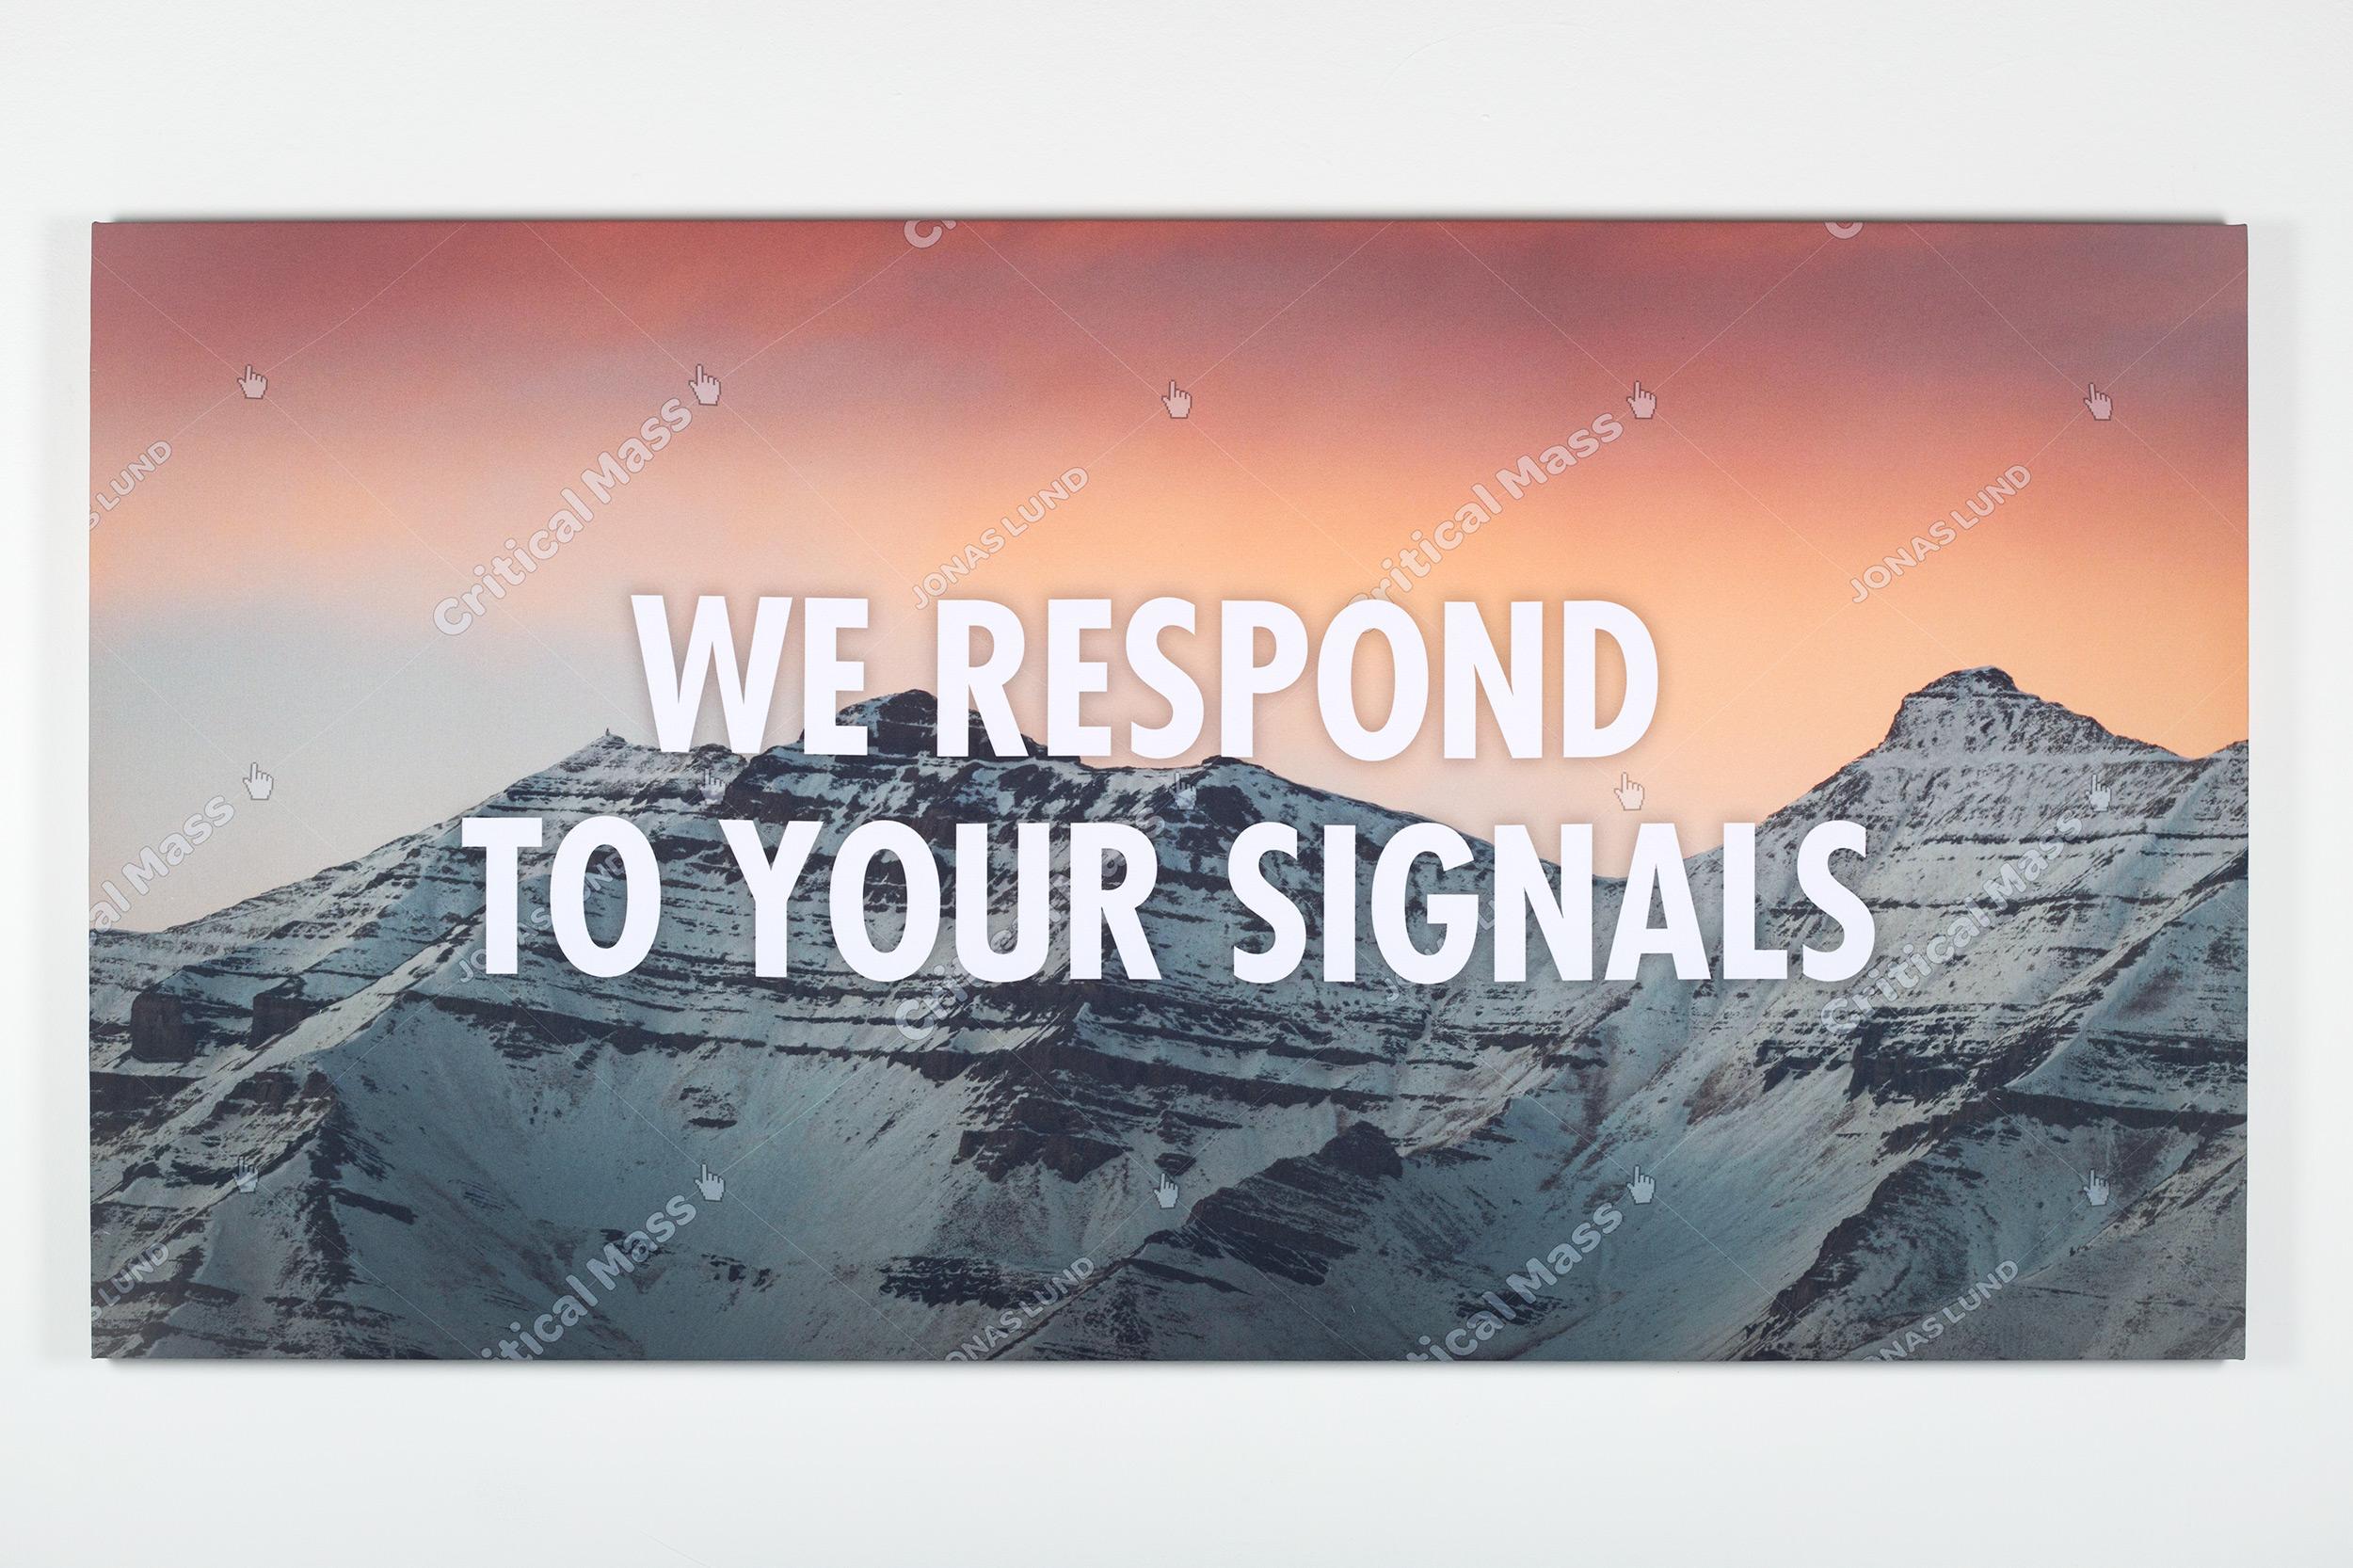 Jonas Lund Critical Mass (We Respond To Your Signals)